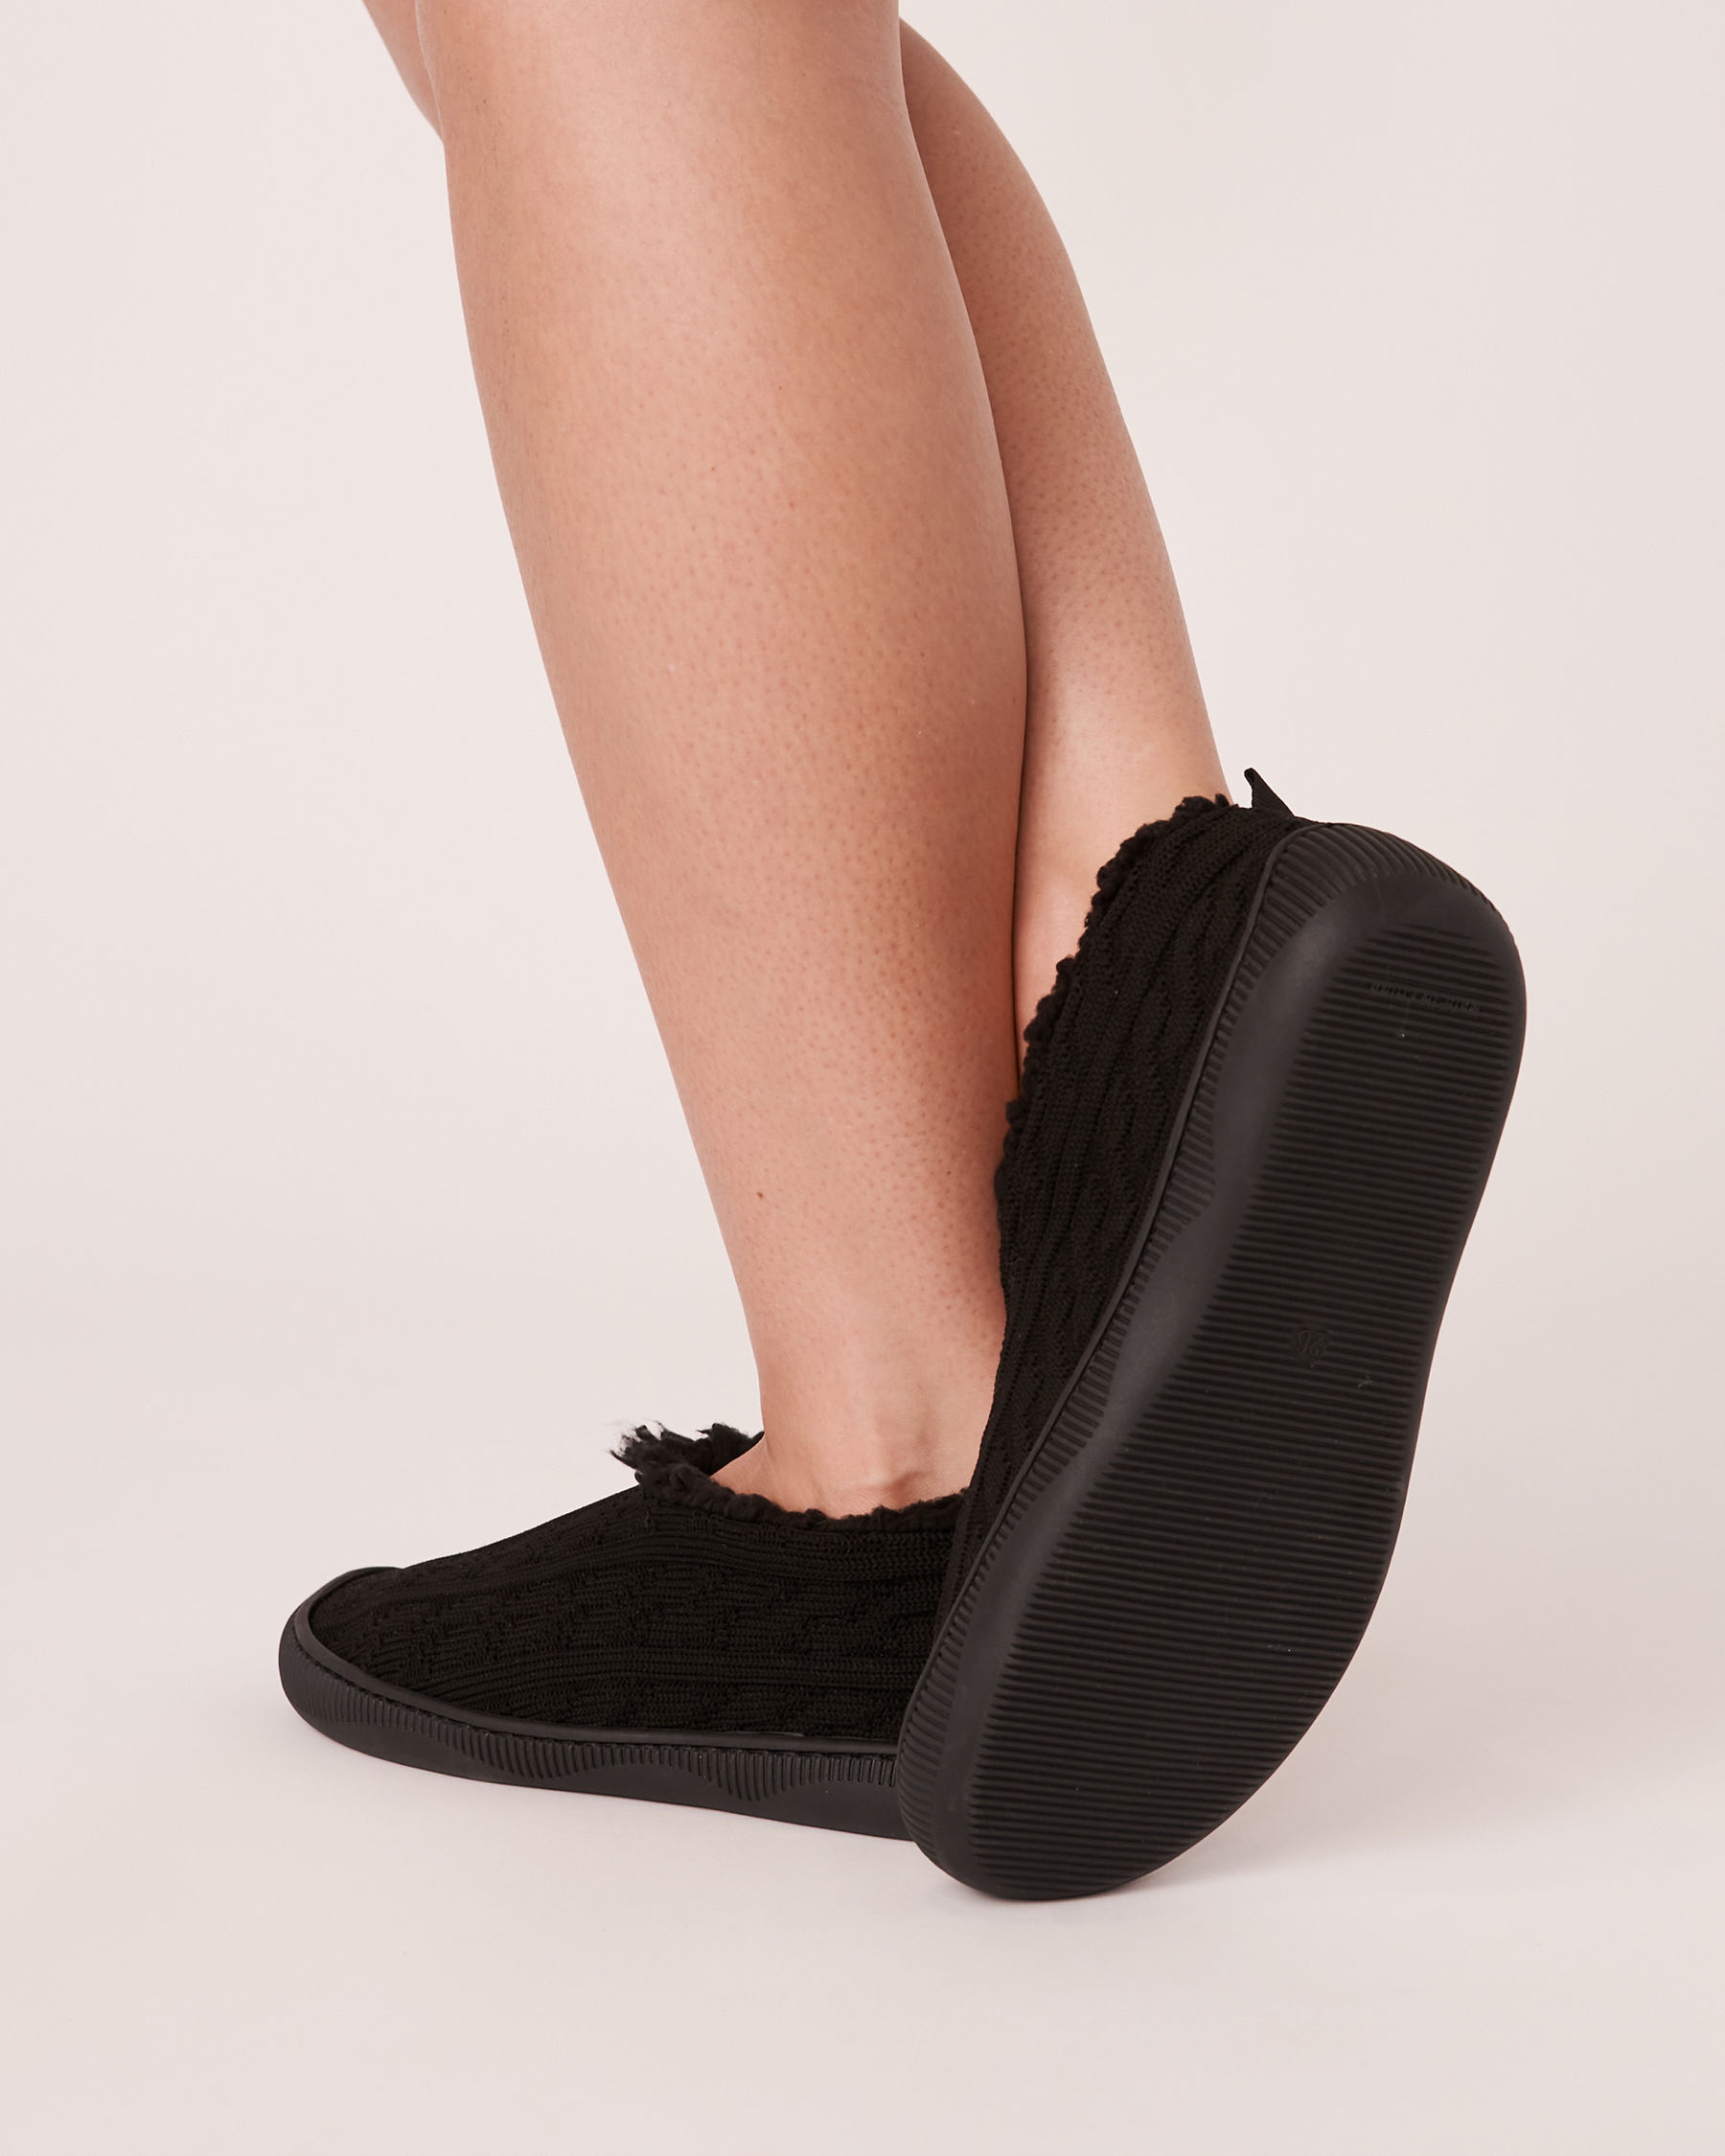 LA VIE EN ROSE Knit Effect Bootie Slippers Black 40700074 - View2